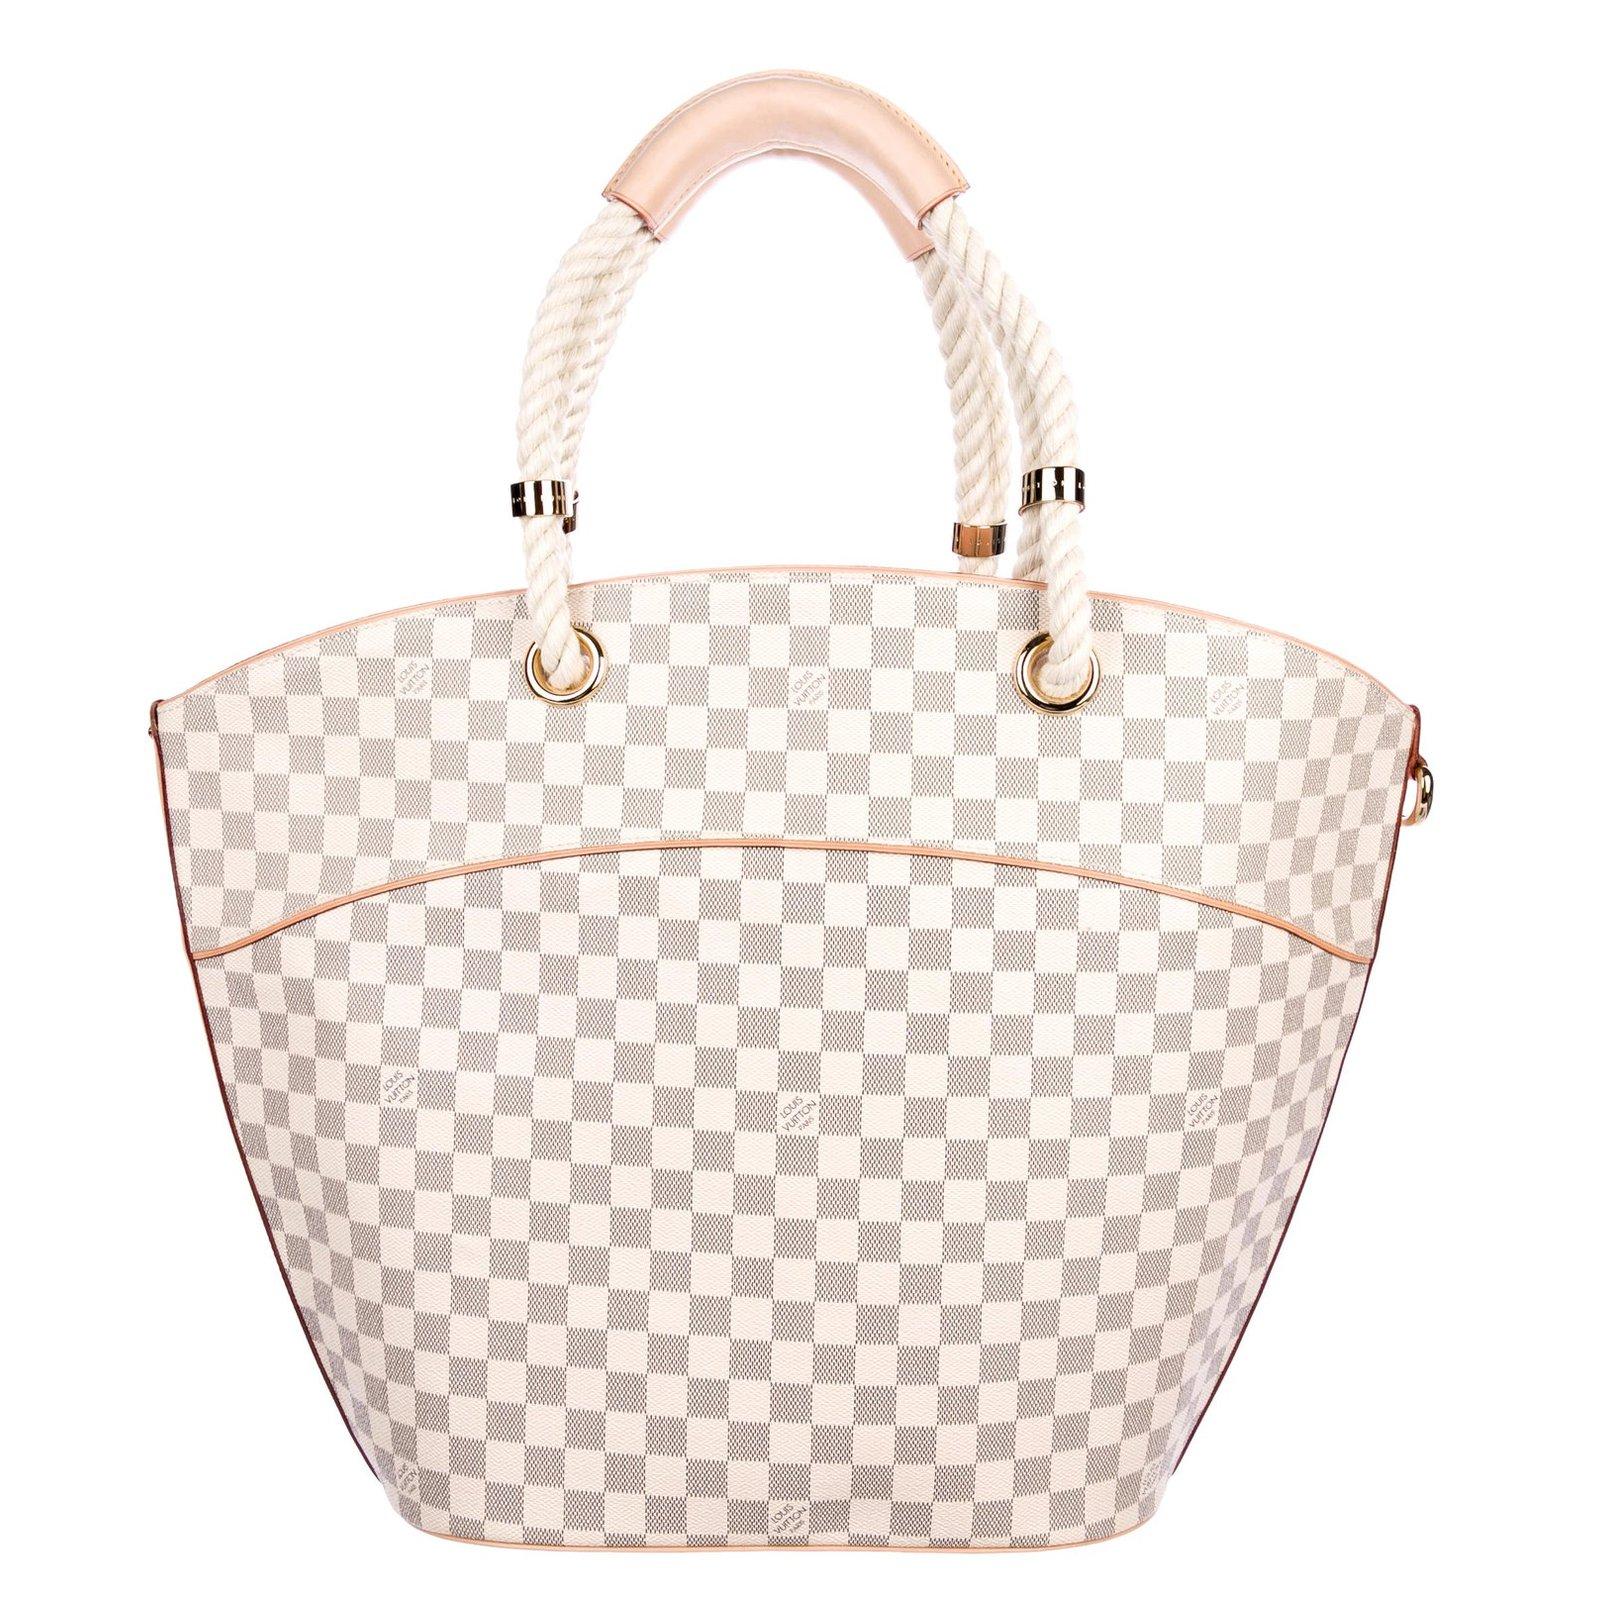 f5080c87fc Louis Vuitton Damien Azur Tote Bag Pampelonne GM(large size) Totes Leather  Beige